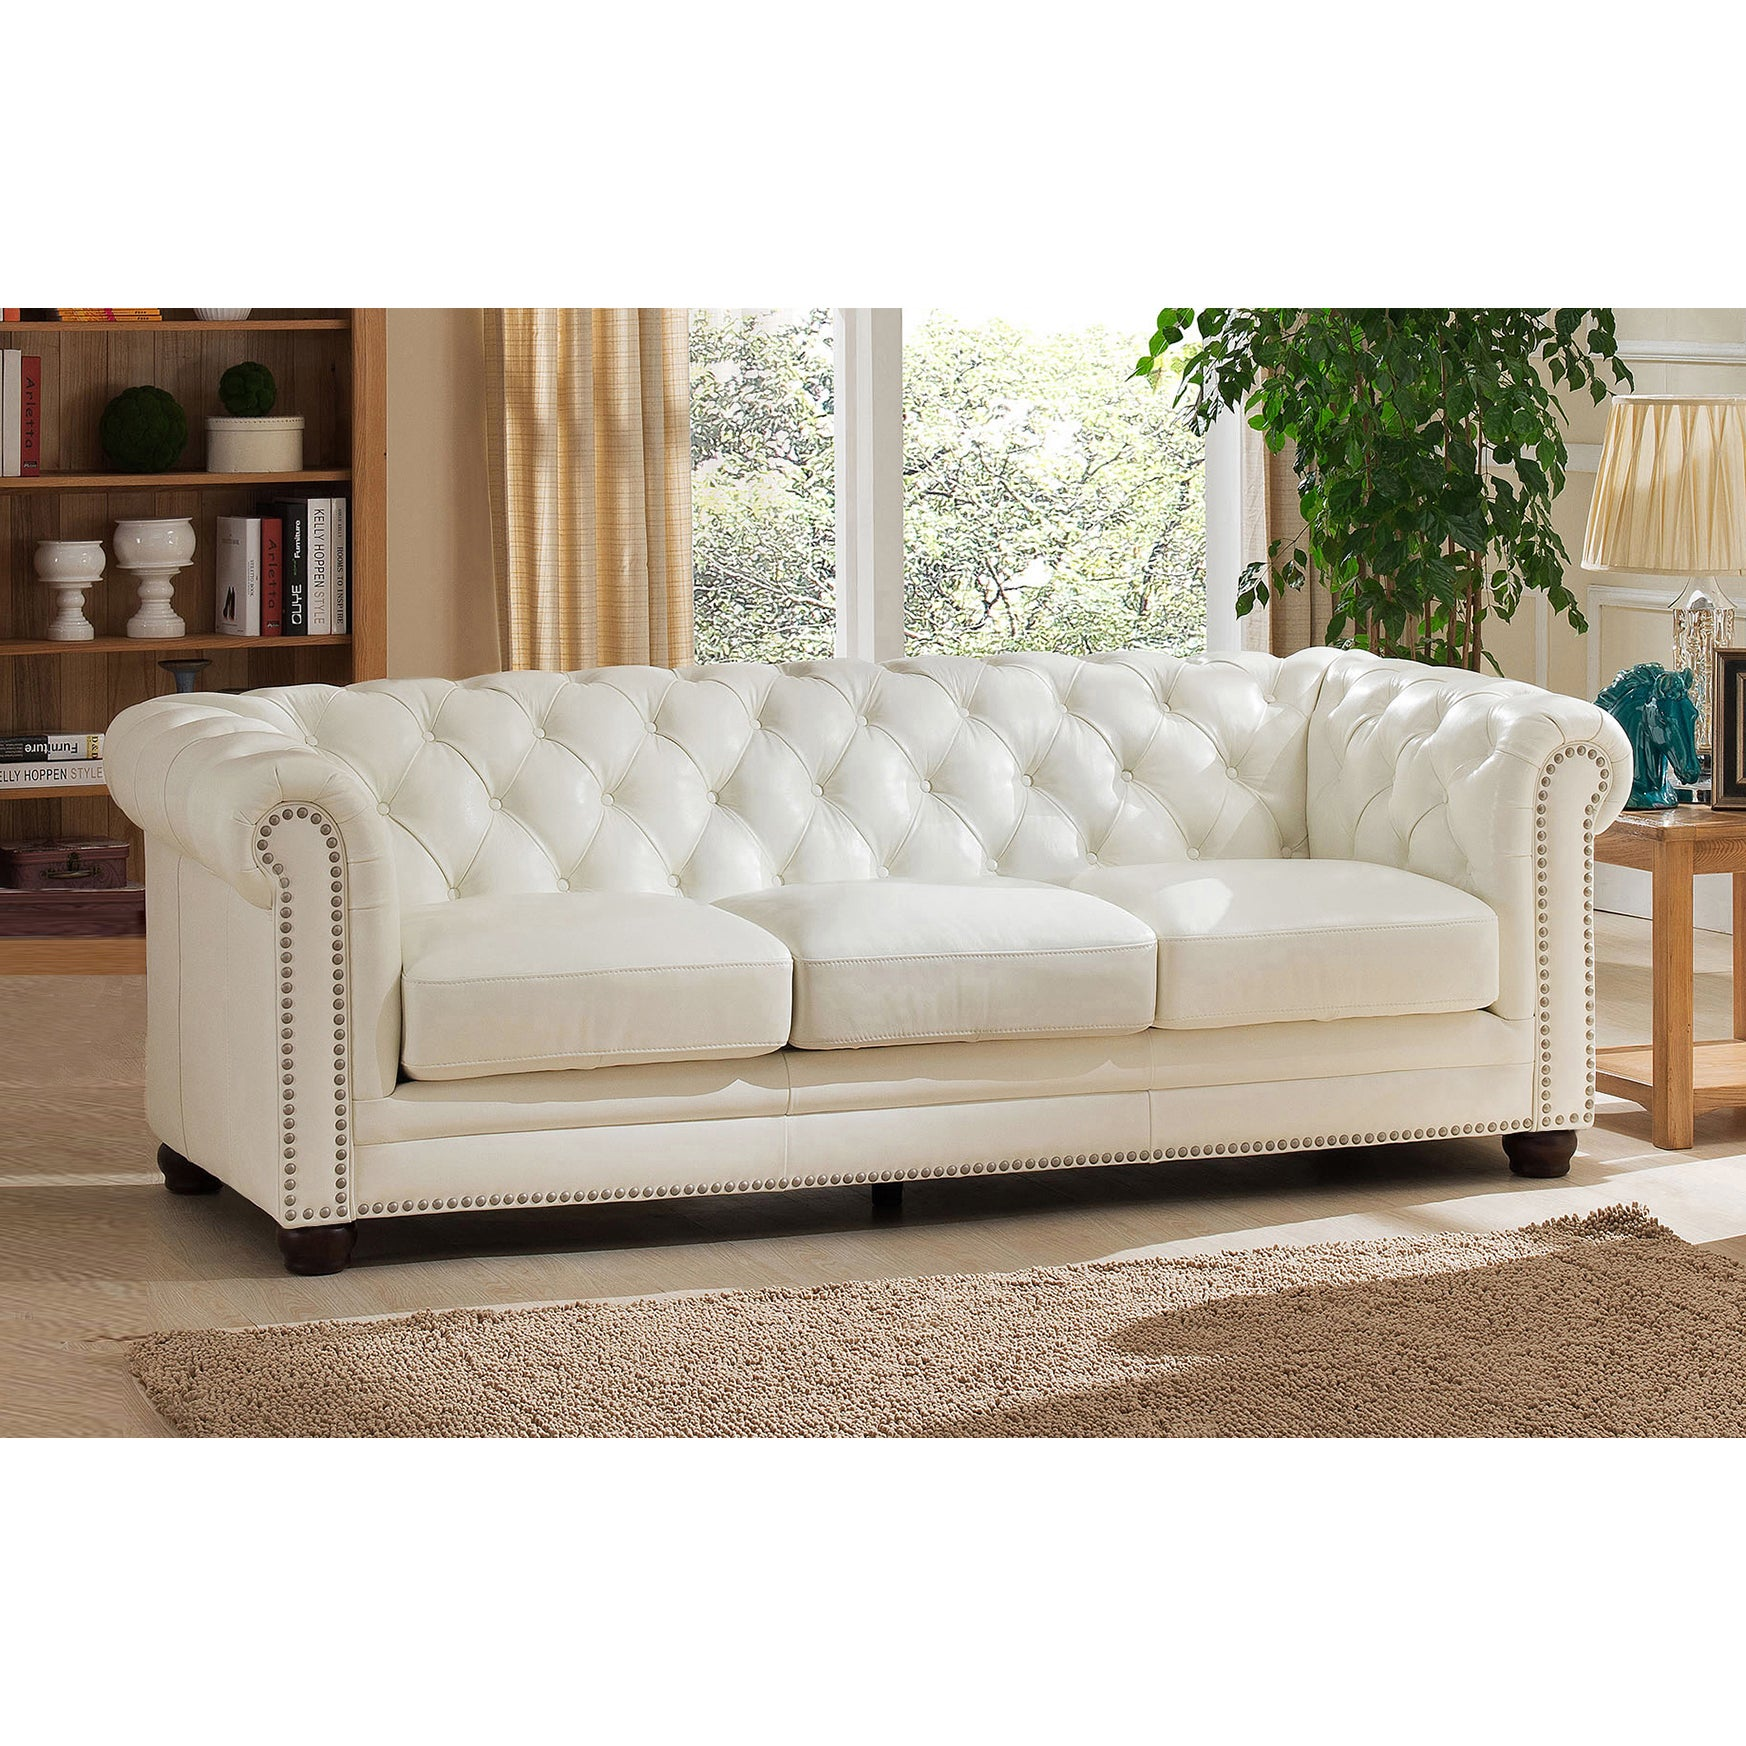 White Genuine Leather Chesterfield Sofa